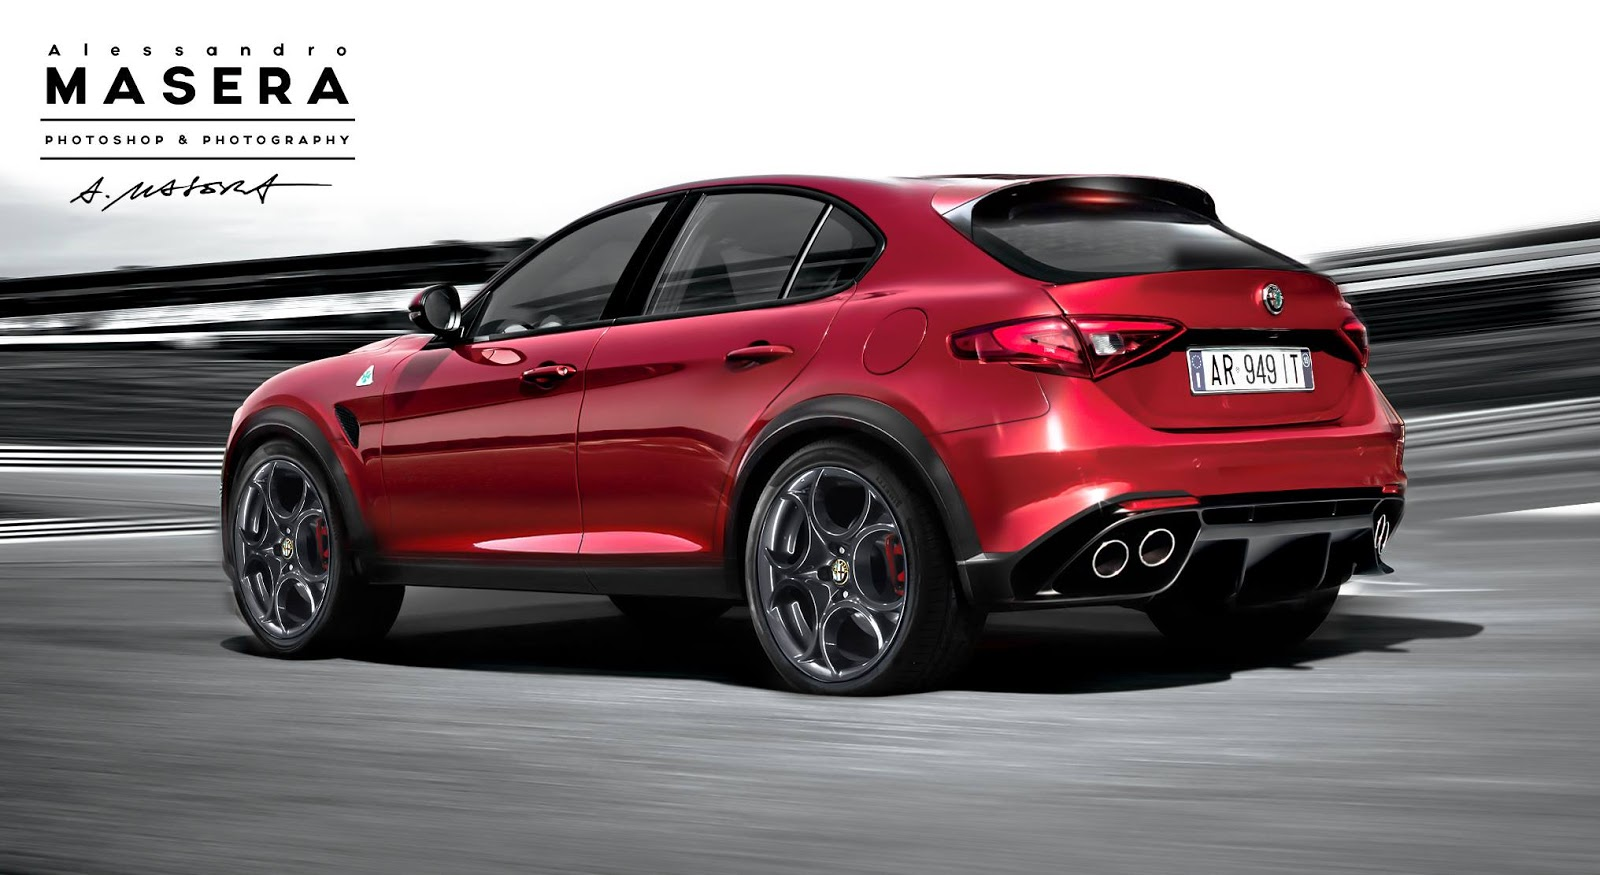 Alfa Romeo Stelvio Suv Green Lighted Gets Twin Turbo V6 Transmission Diagrams Render Rear Quarter